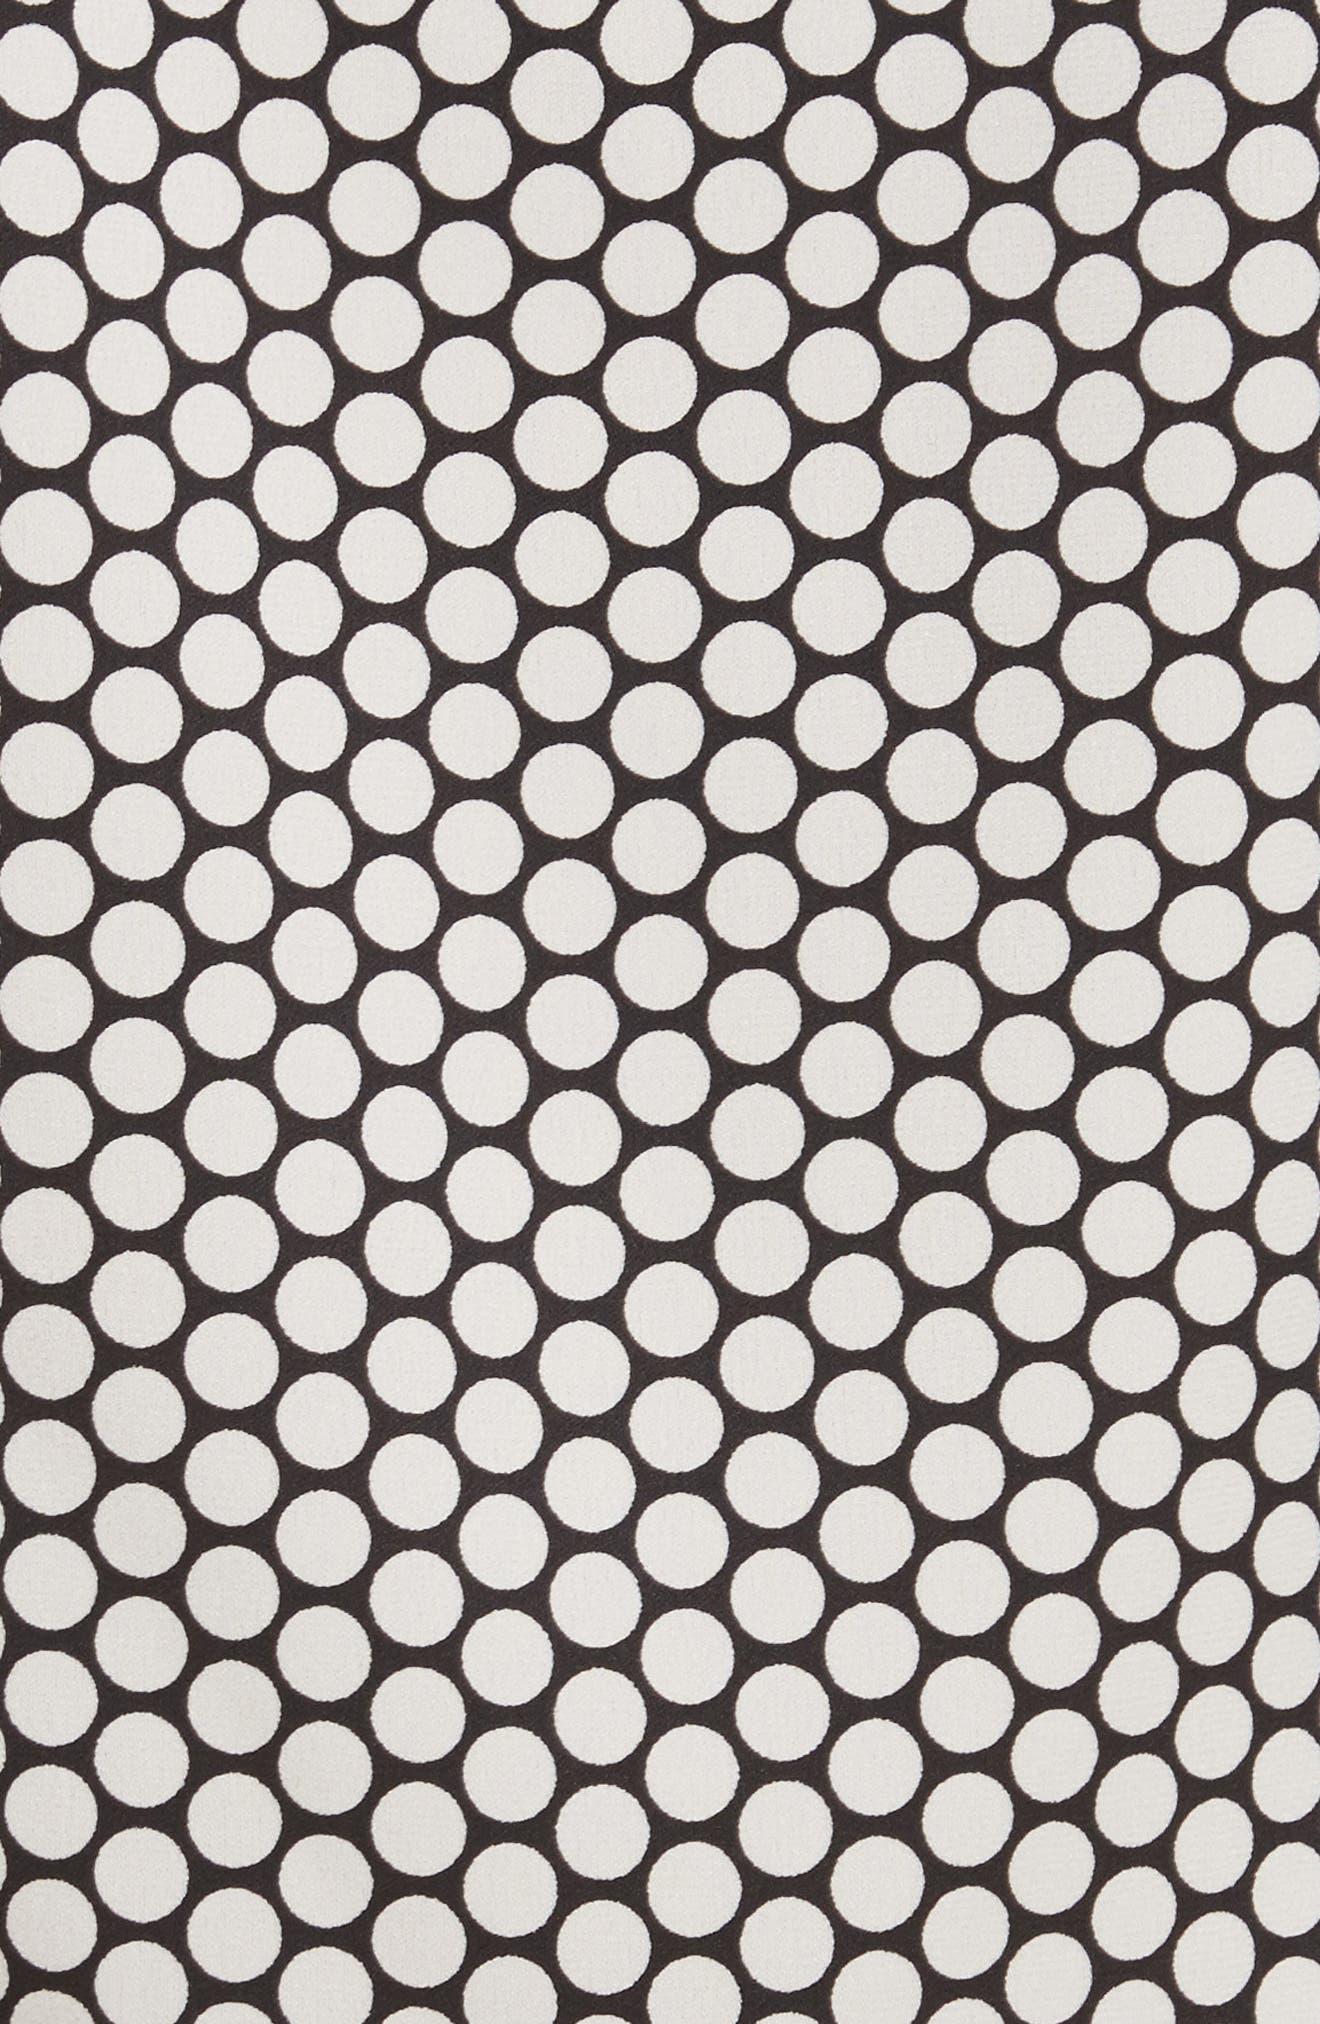 Diane von Furstenberg Stretch Silk Wrap Blouse,                             Alternate thumbnail 5, color,                             Rowe Dot Ivory